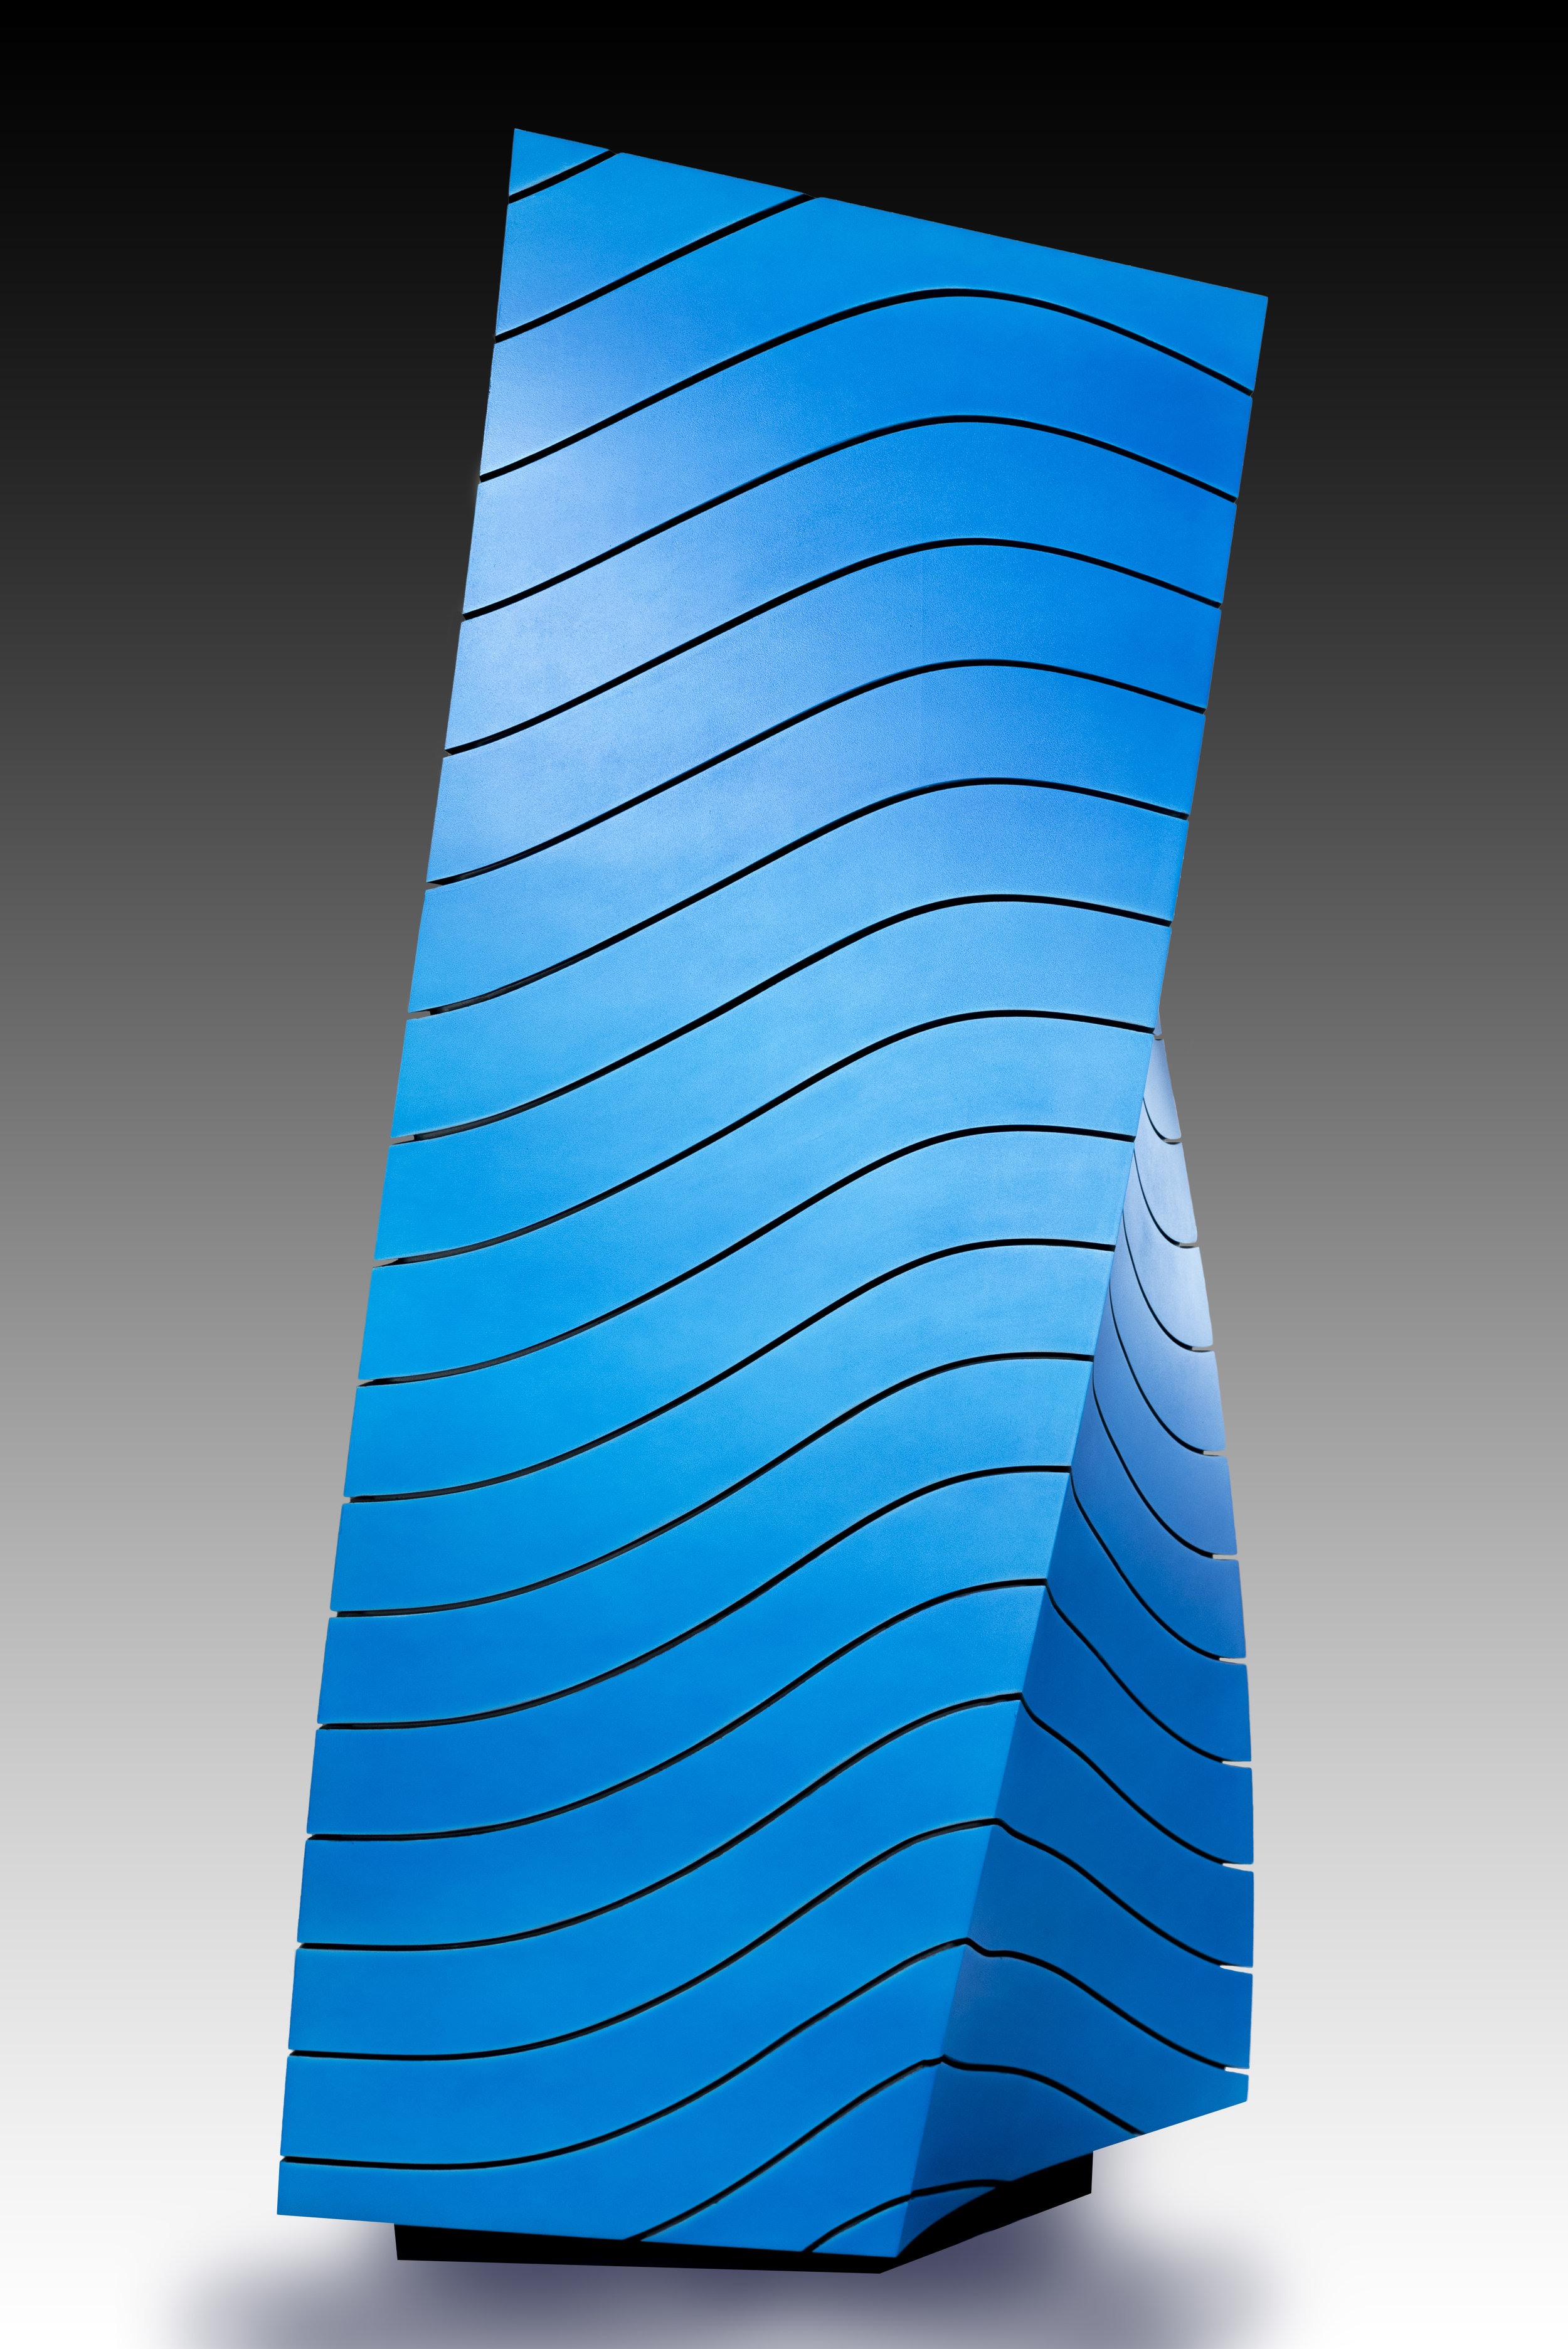 Blue Blade 02 © Jonathan Spring